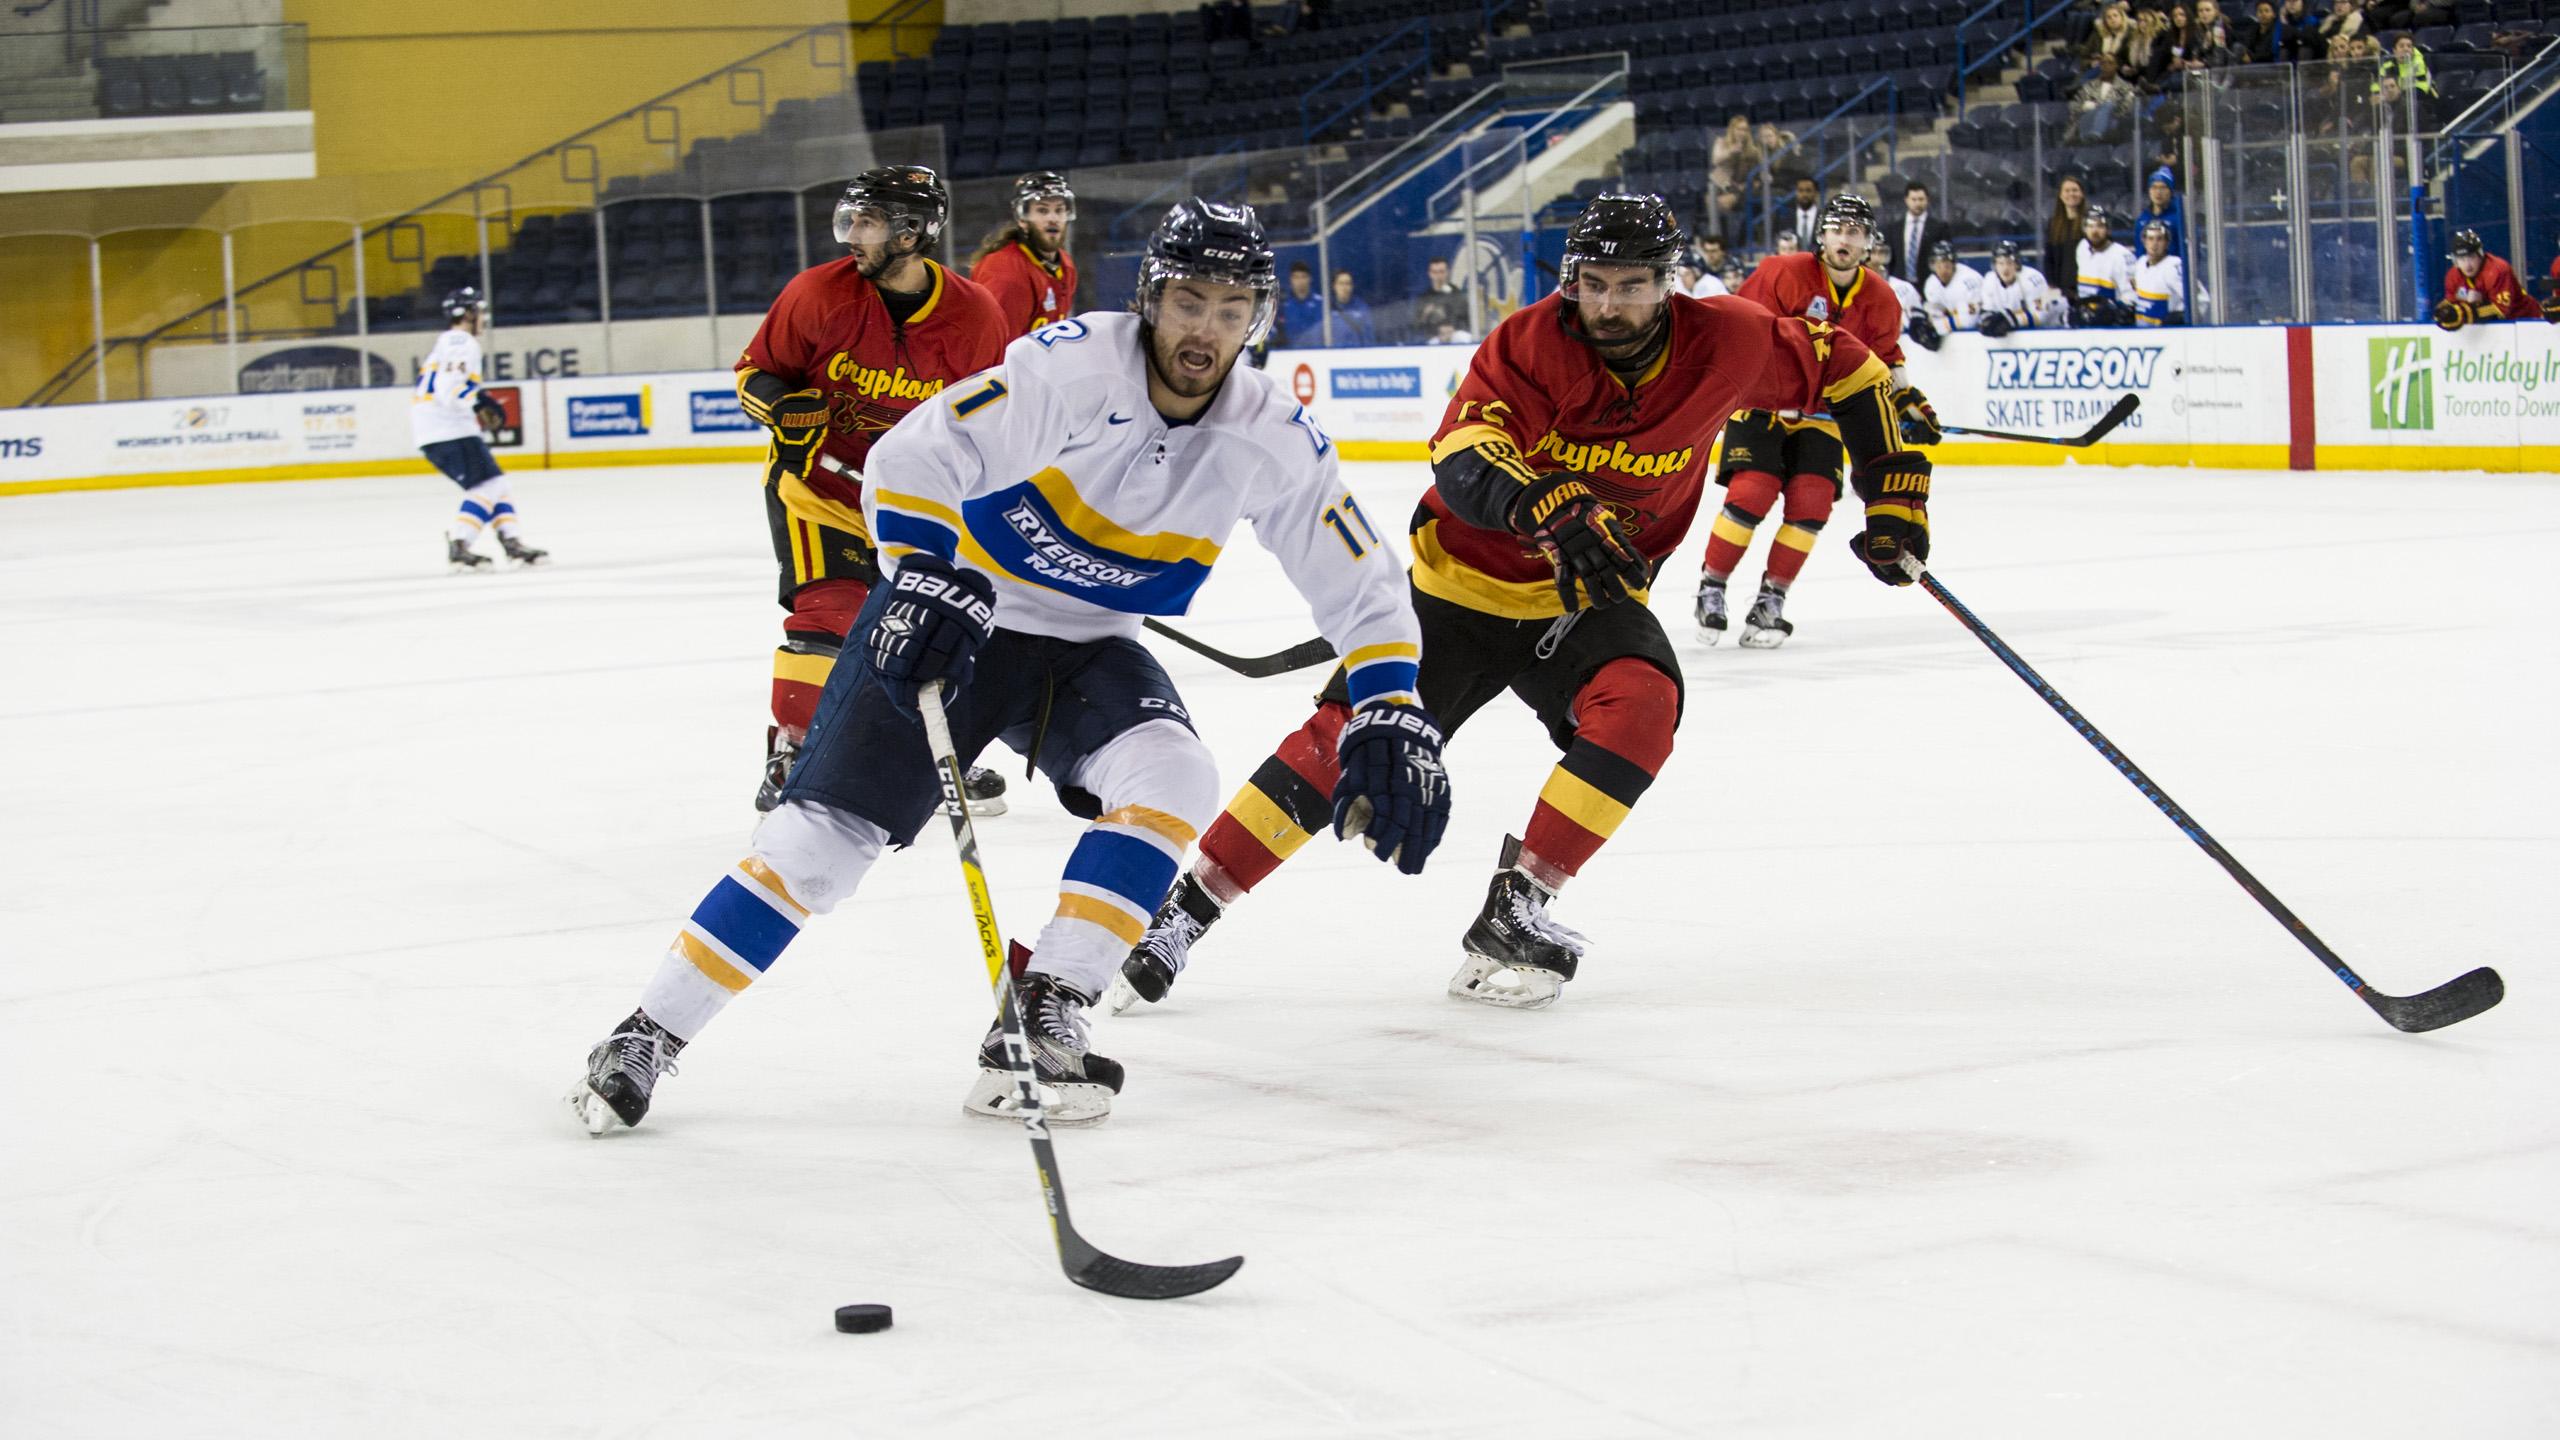 MensHockey1_Feb-7_AndrejIvanov